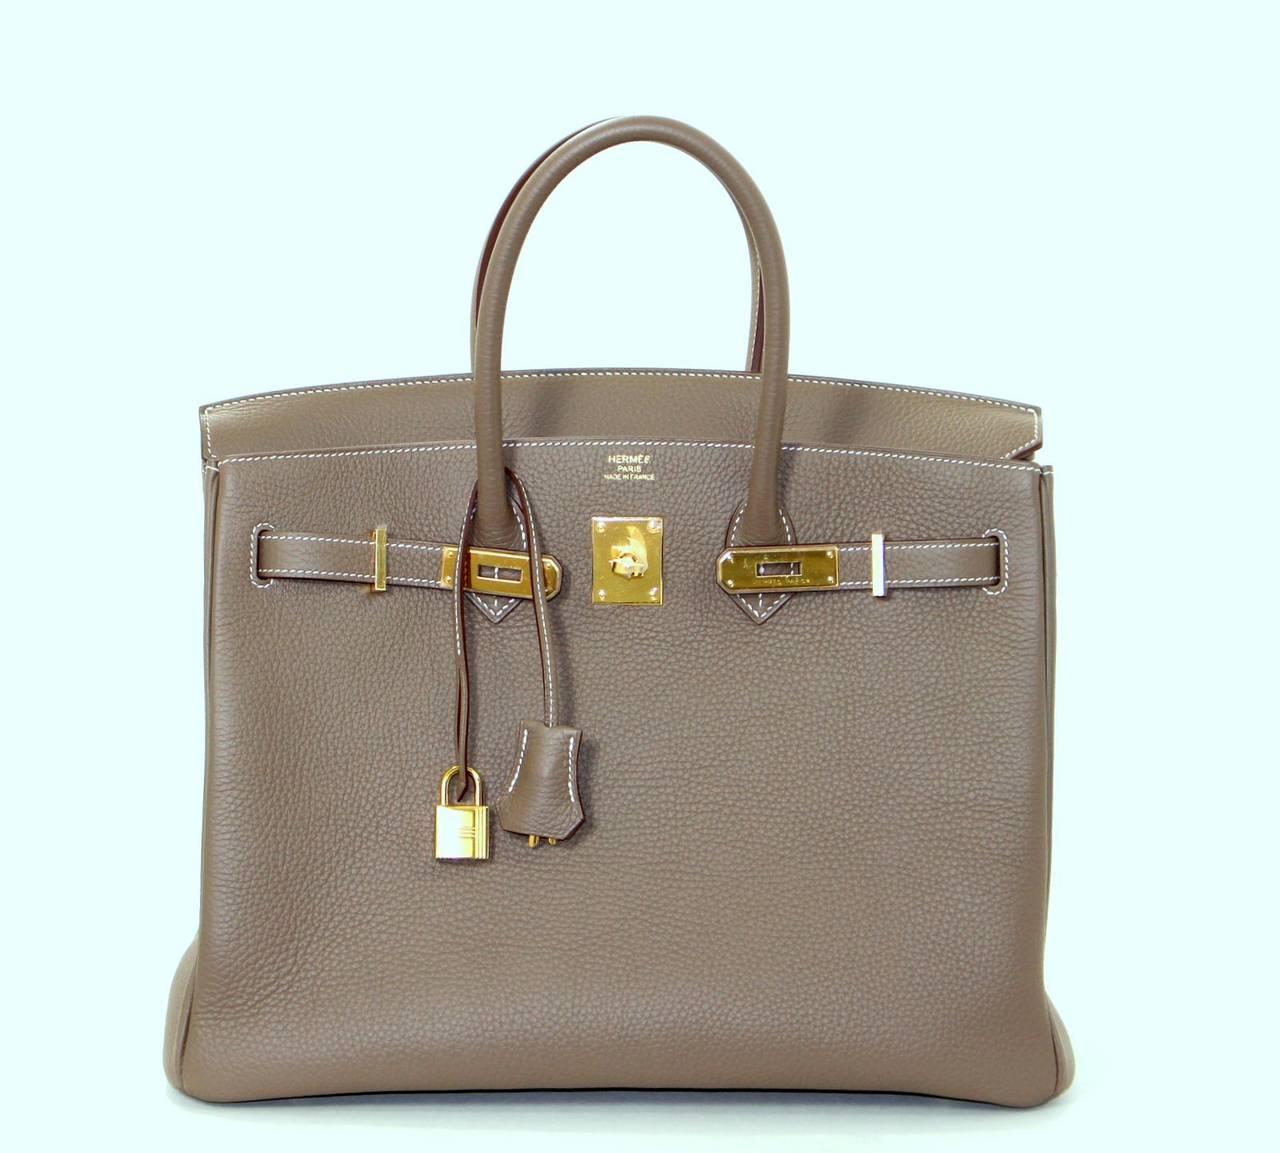 Herm 232 S Etoupe Togo Leather Birkin Bag With Gold 35 Cm